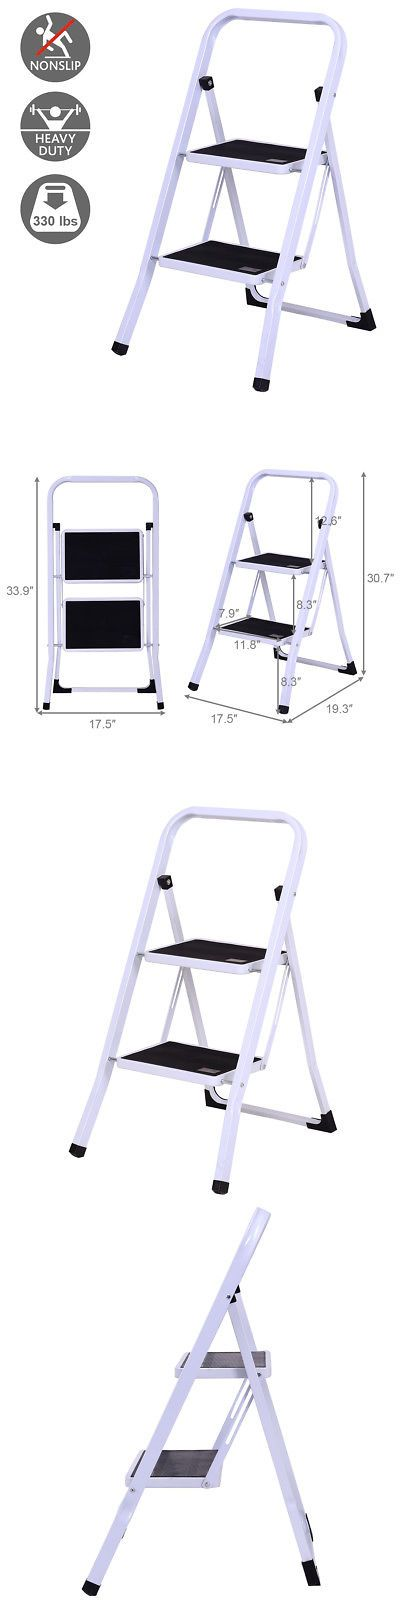 Ladders 112567 2 Step Ladder Folding Steel Step Stool Anti Slip Heavy Duty With 330lbs Capacity Buy It Now Only 32 99 Step Ladders Steel Stool Step Stool